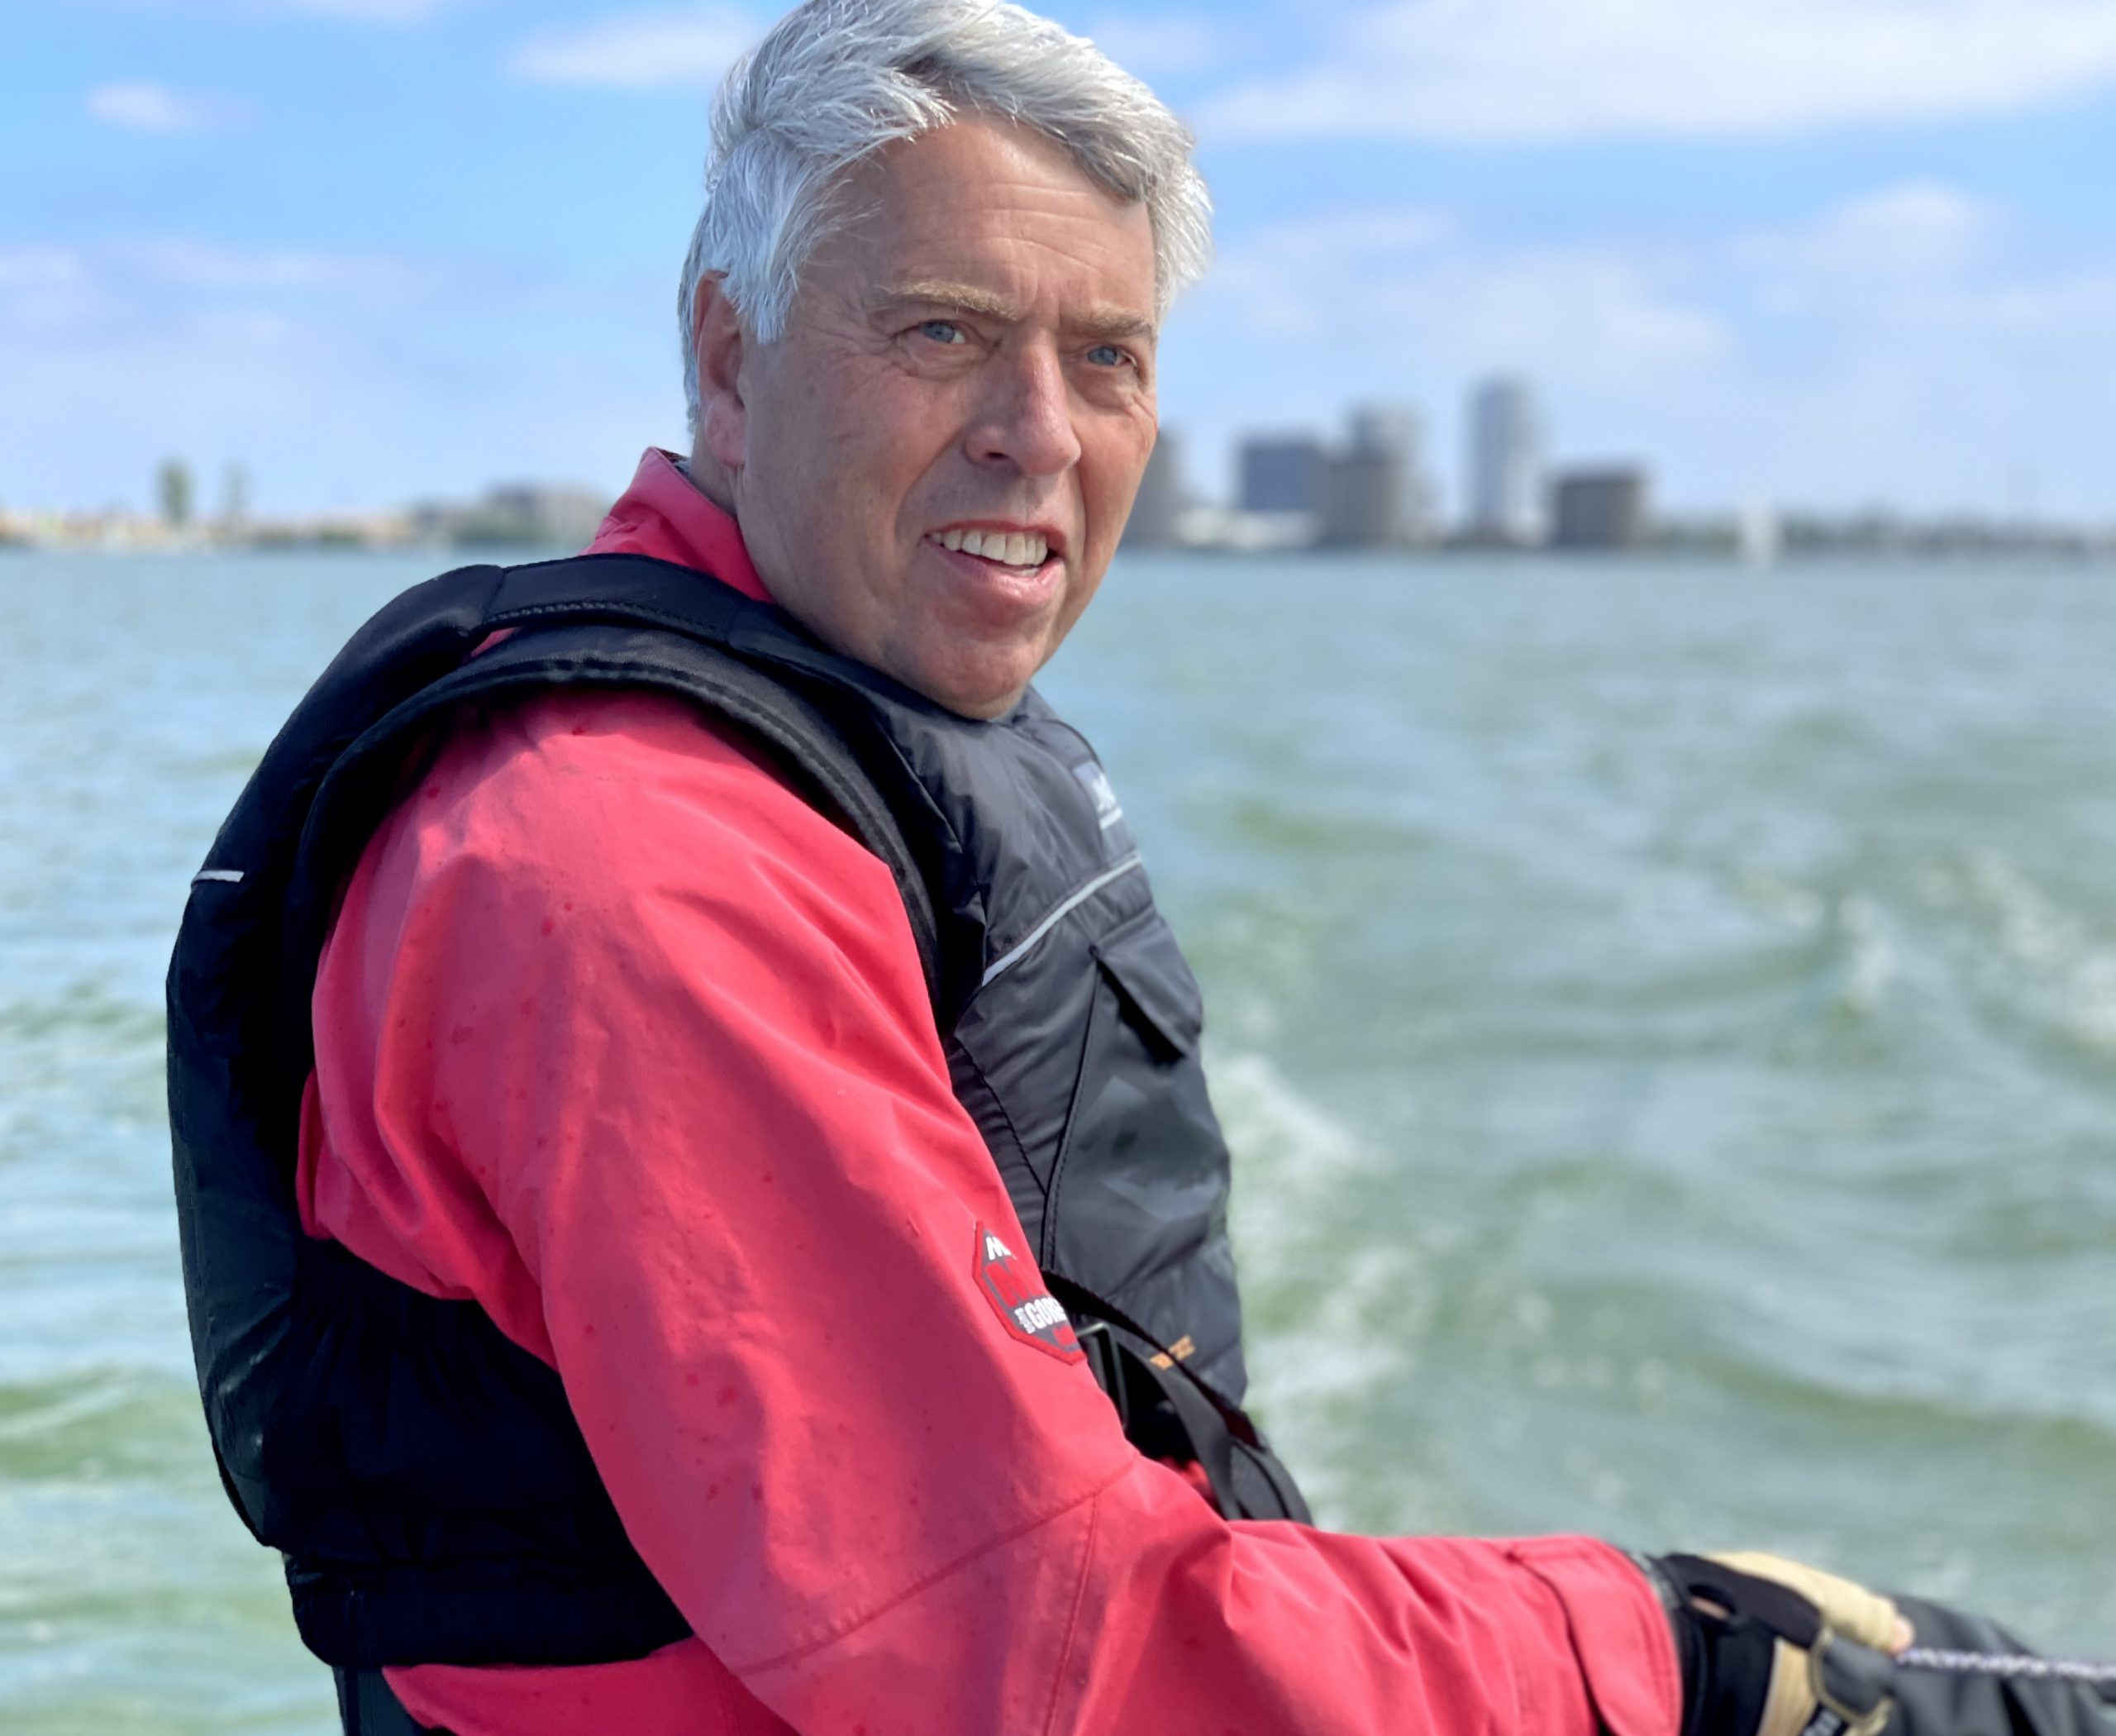 Peter Blom leaving Triodos Bank after 41 years